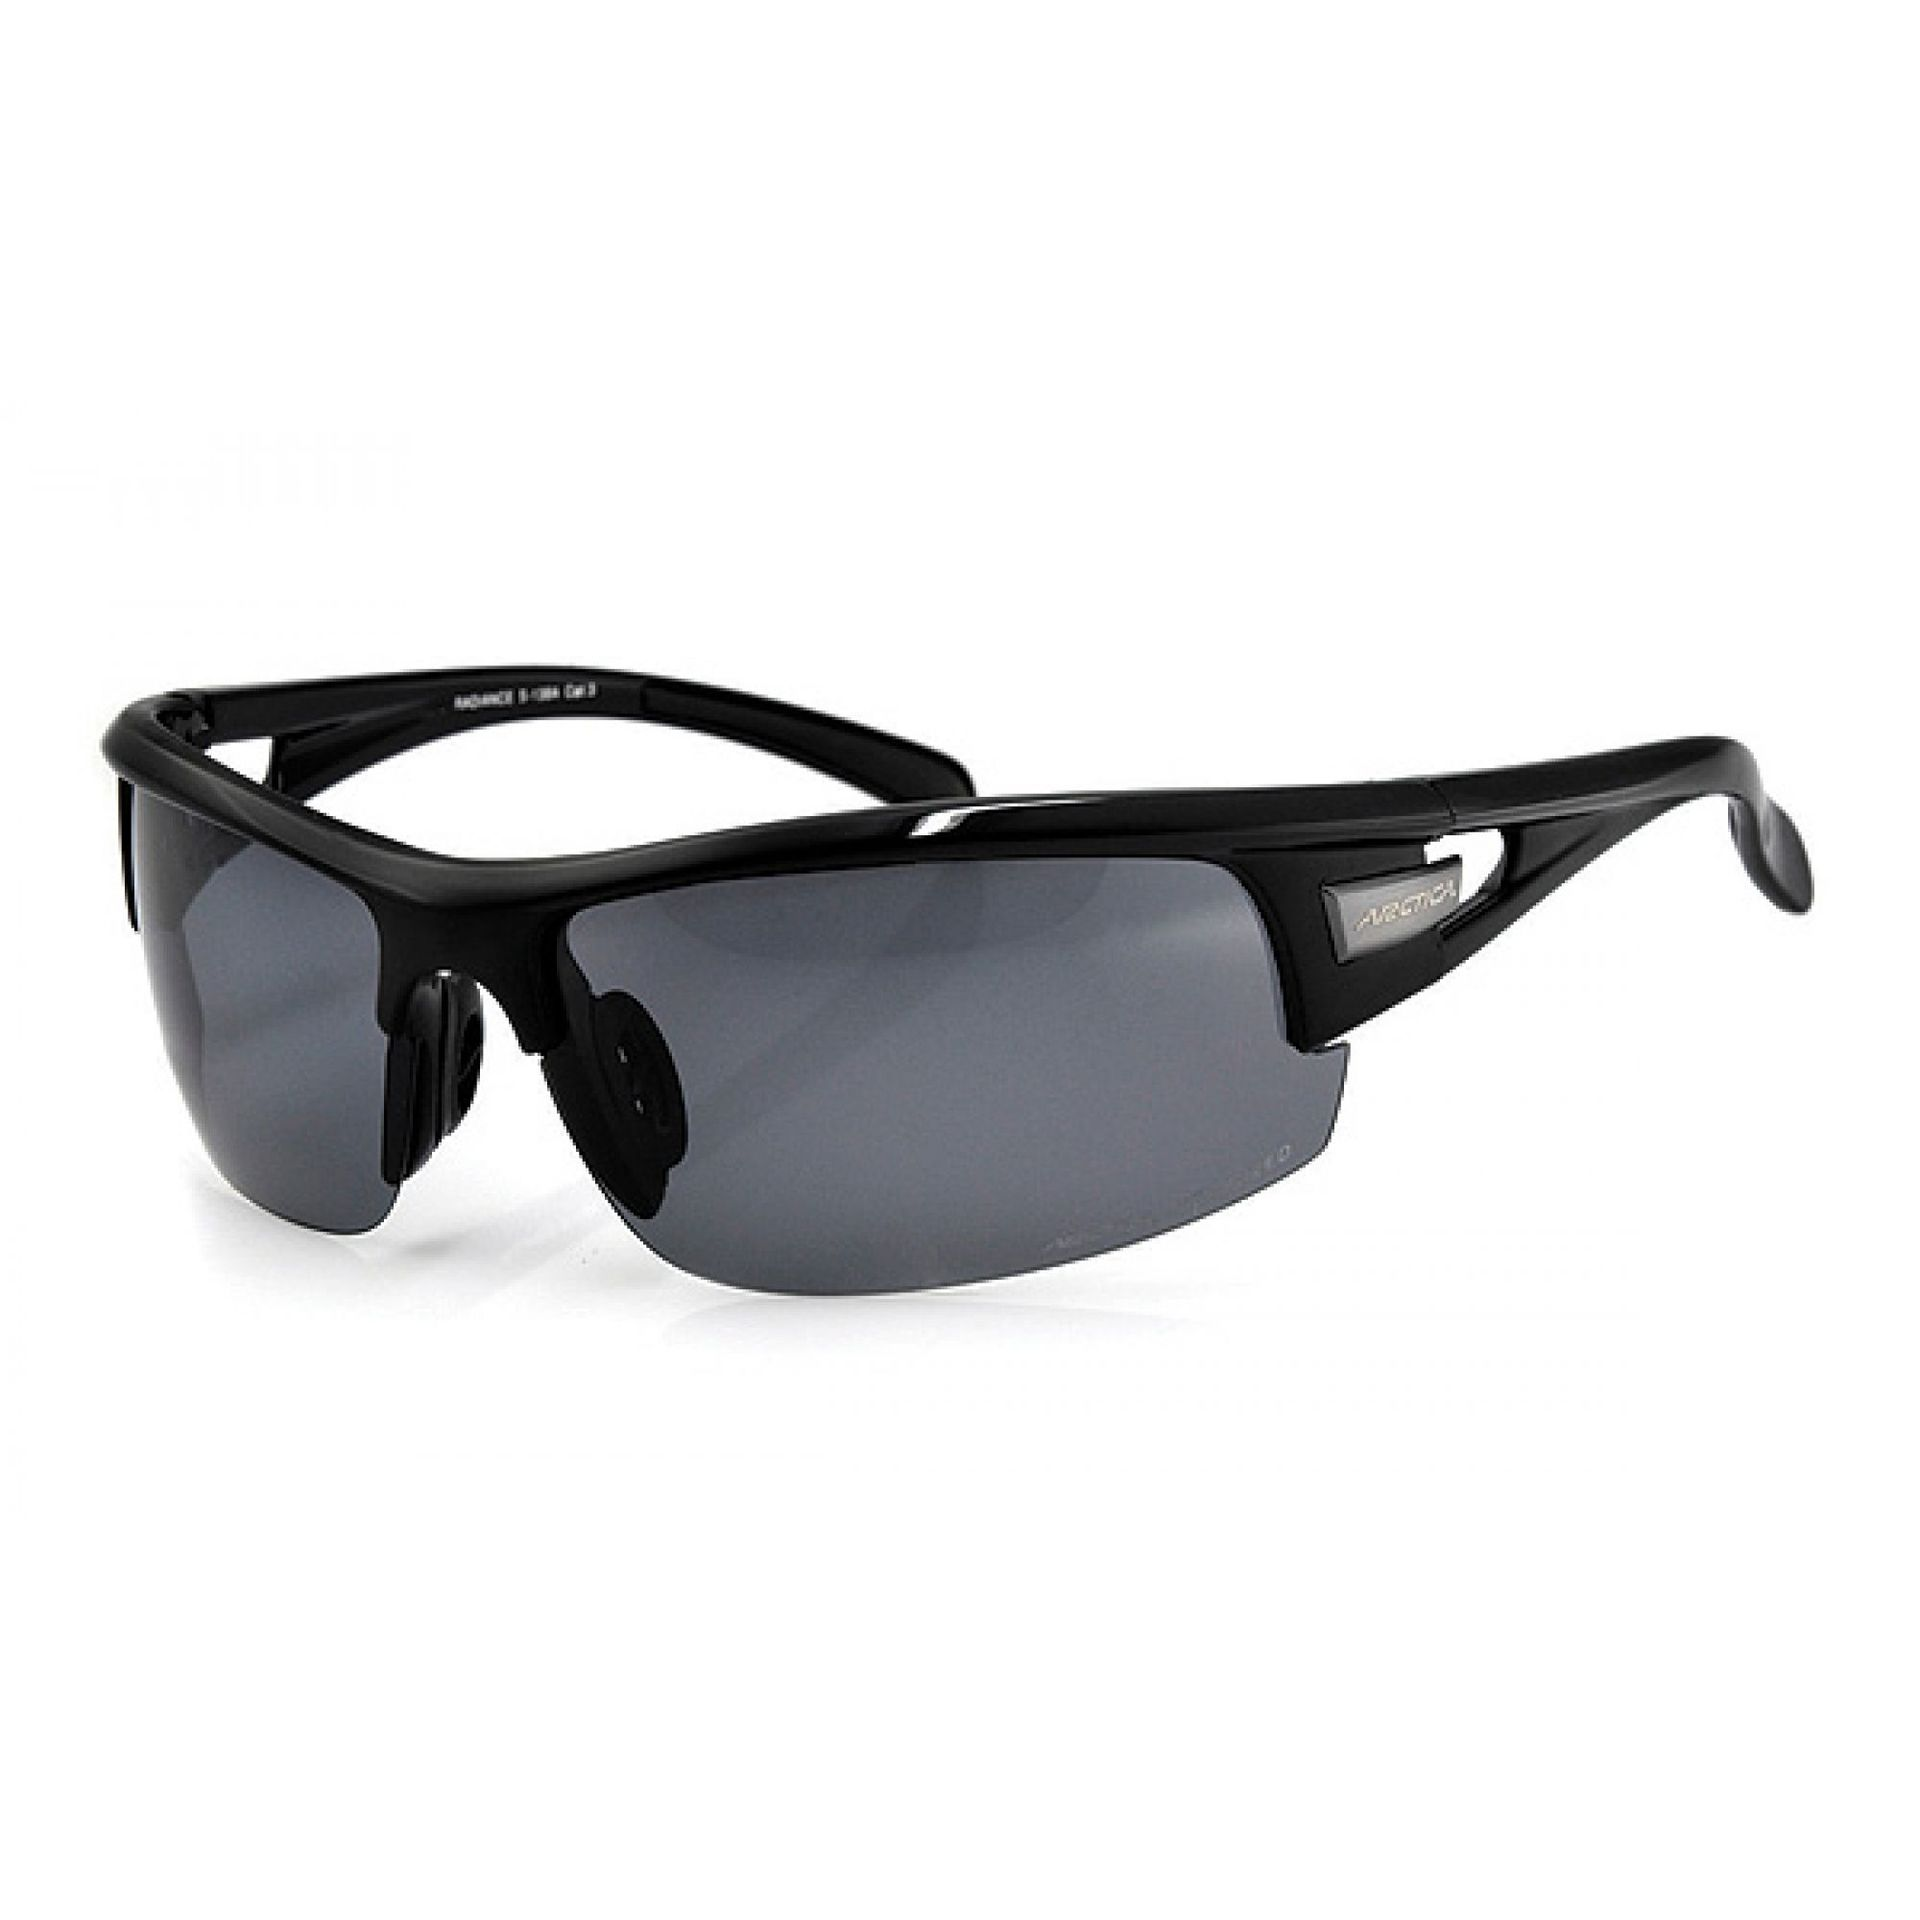 Okulary Arctica S-138 czarne